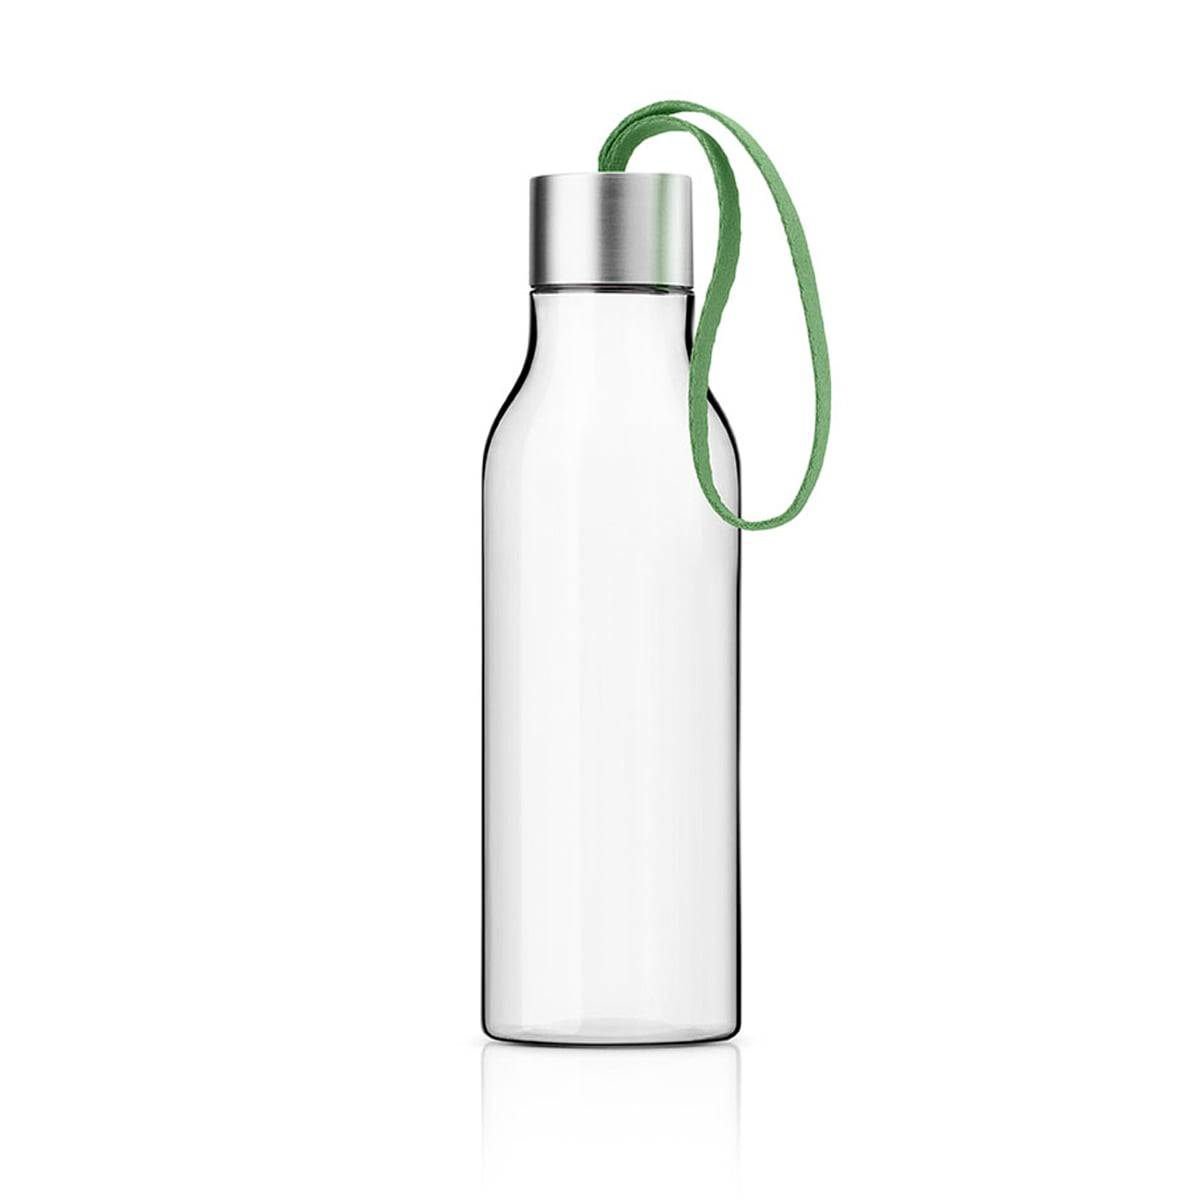 Eva Solo A/S Eva Solo - Trinkflasche 0,5 l, botanic green | Küche und Esszimmer | Grün | Flasche: schlagfestes tritan -  bpa frei -  deckel: 18/10 edelstahl -  pp kunststoff -  silikonring -  band: terylen-polyester | Eva Solo A/S